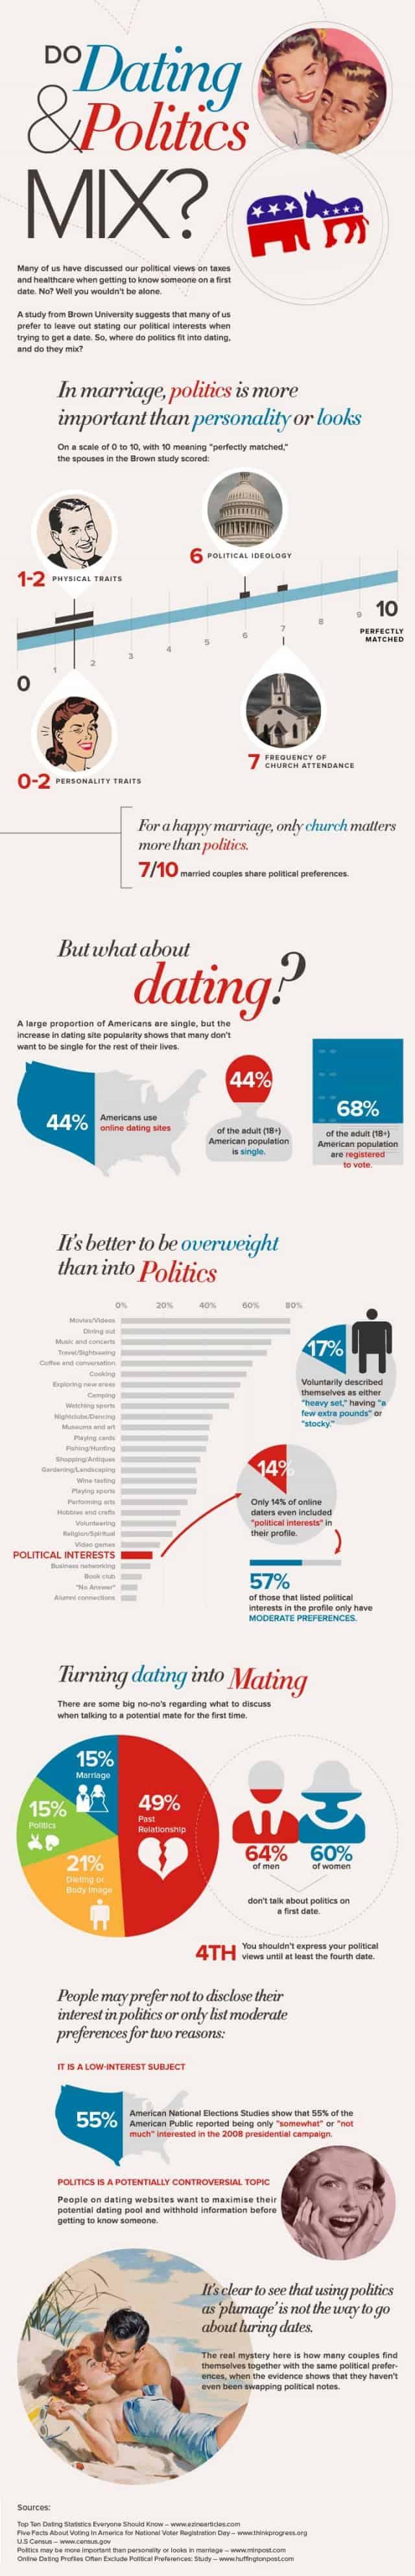 Politics & Dating